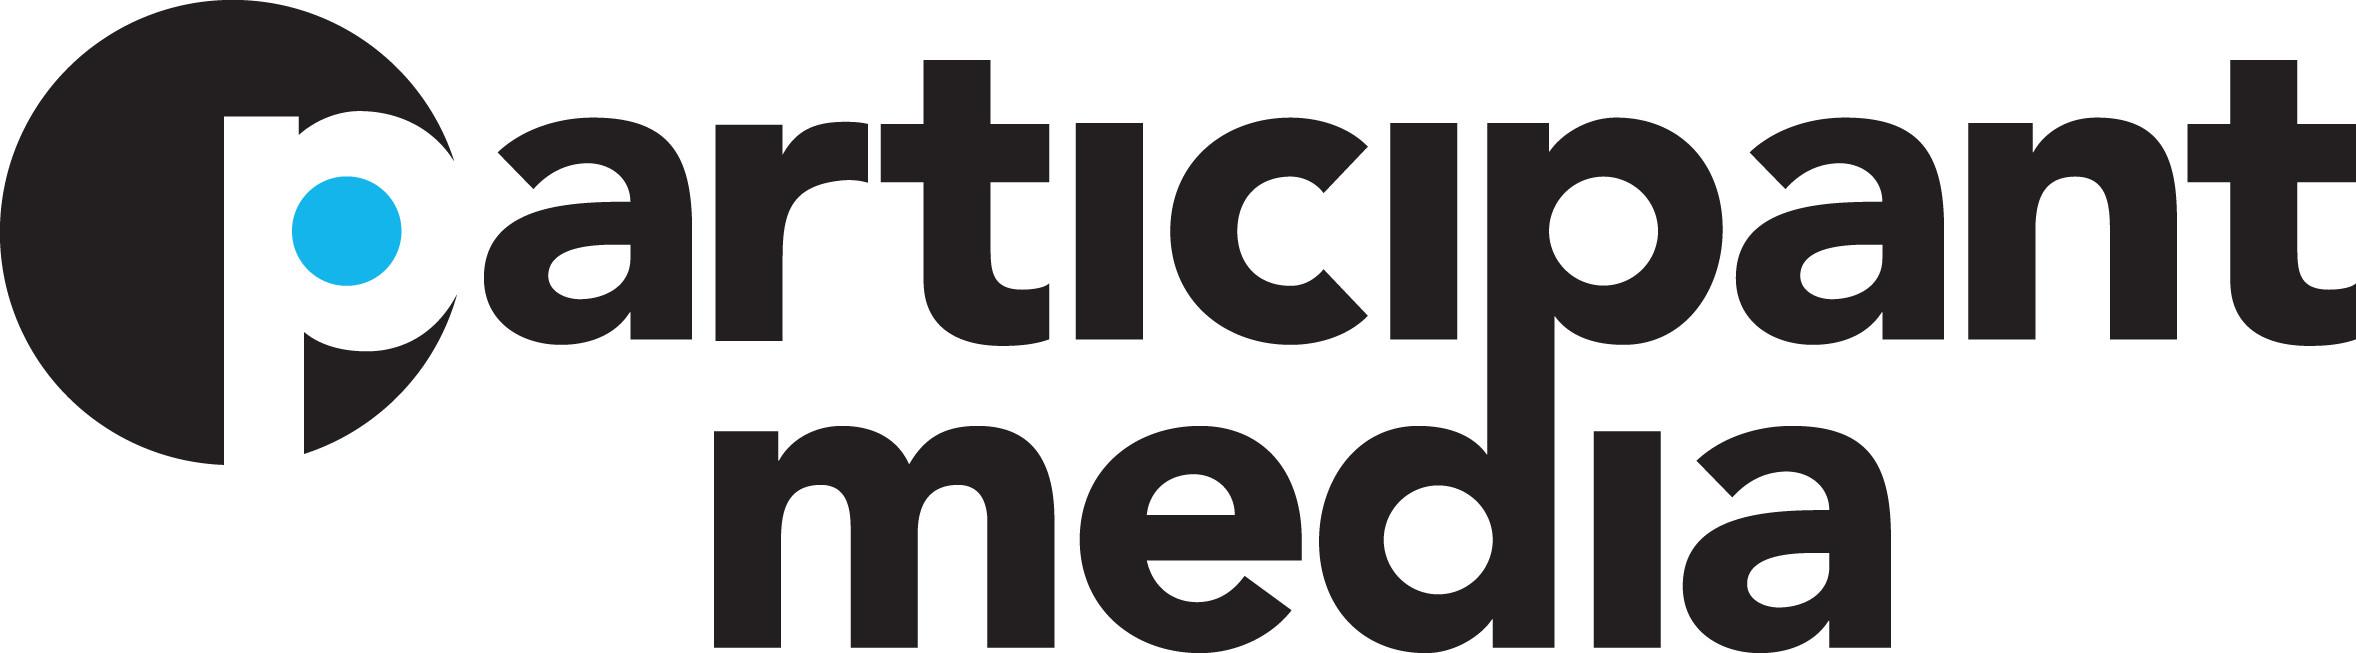 8.5_Participant.Logo.FINAL-2.jpg